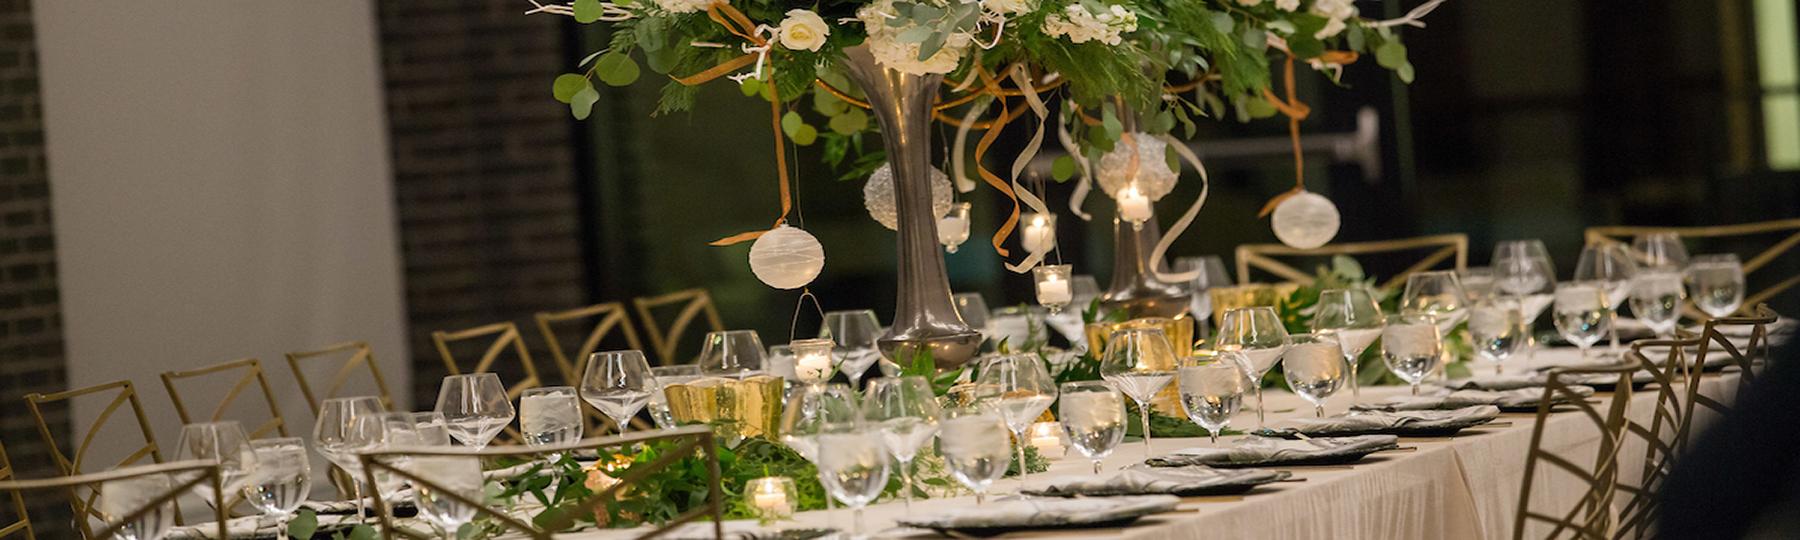 Wedding Dinning Table: Wedding Venues Columbus Ohio At Websimilar.org